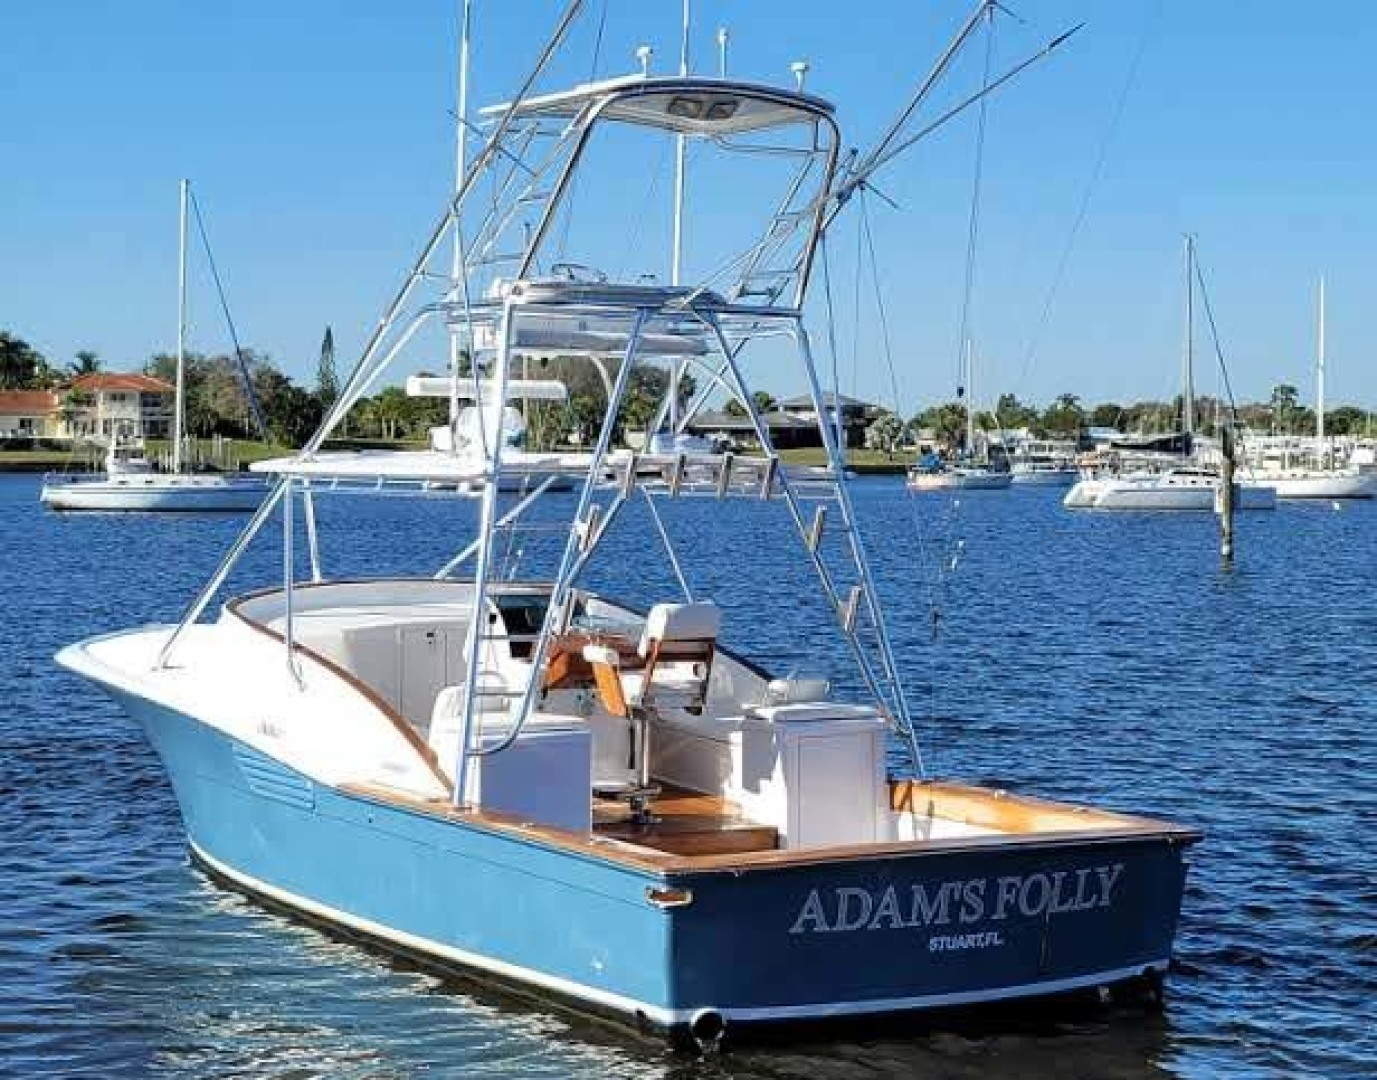 Scopinich-Express 2010-Adams Folly Stuart-Florida-United States-1585137 | Thumbnail